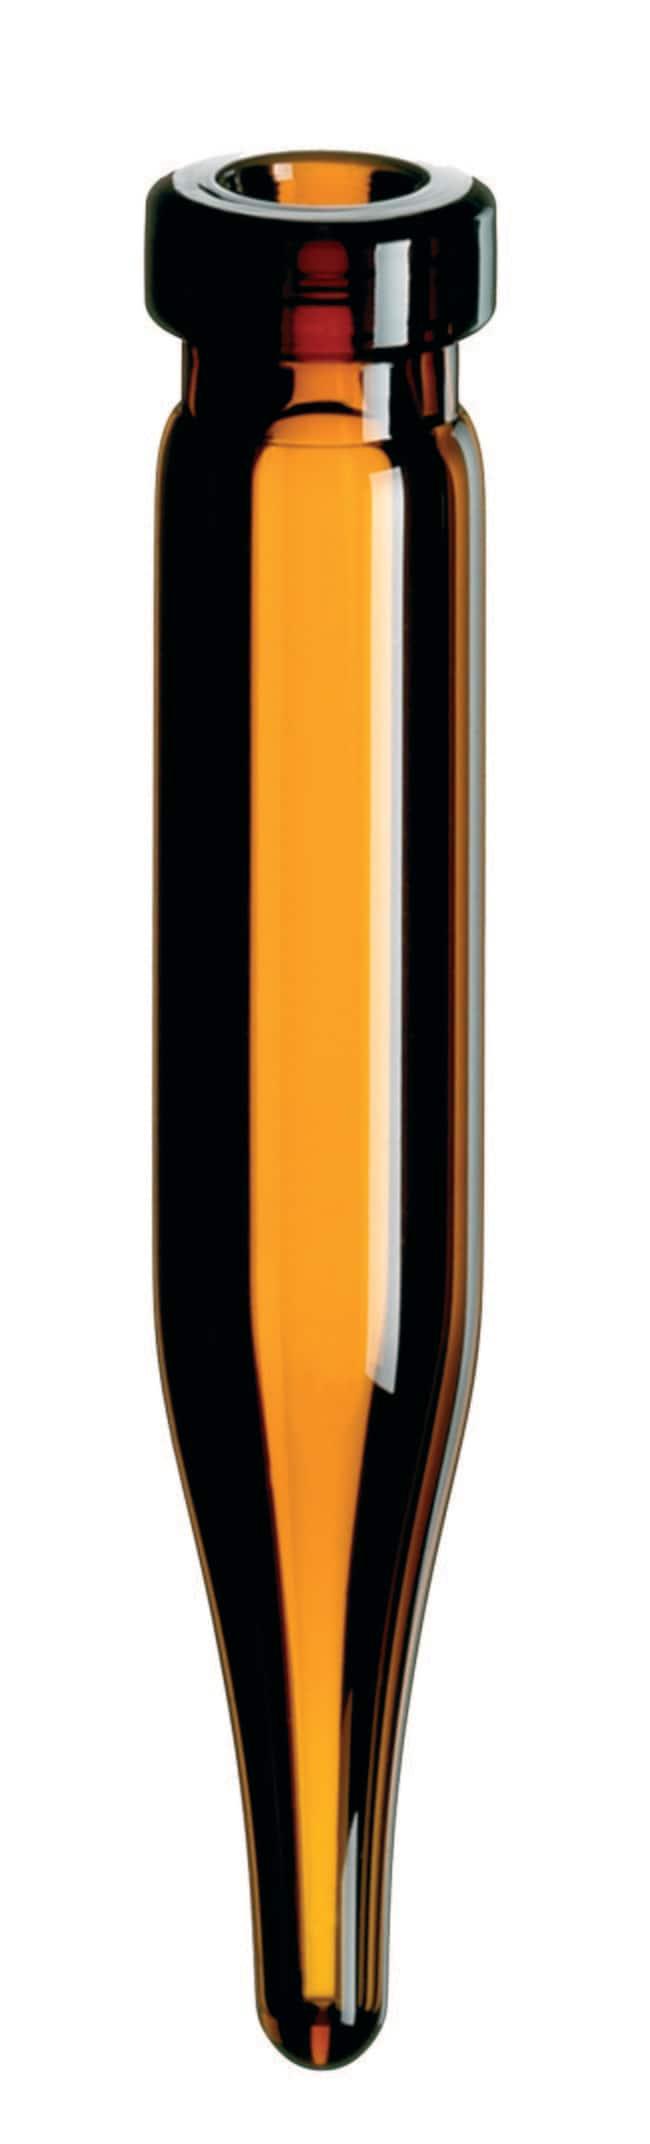 Fisherbrand™8mm Glass Crimp Neck Vial Amber, conical, 0.6mL, 40mm height Fisherbrand™8mm Glass Crimp Neck Vial